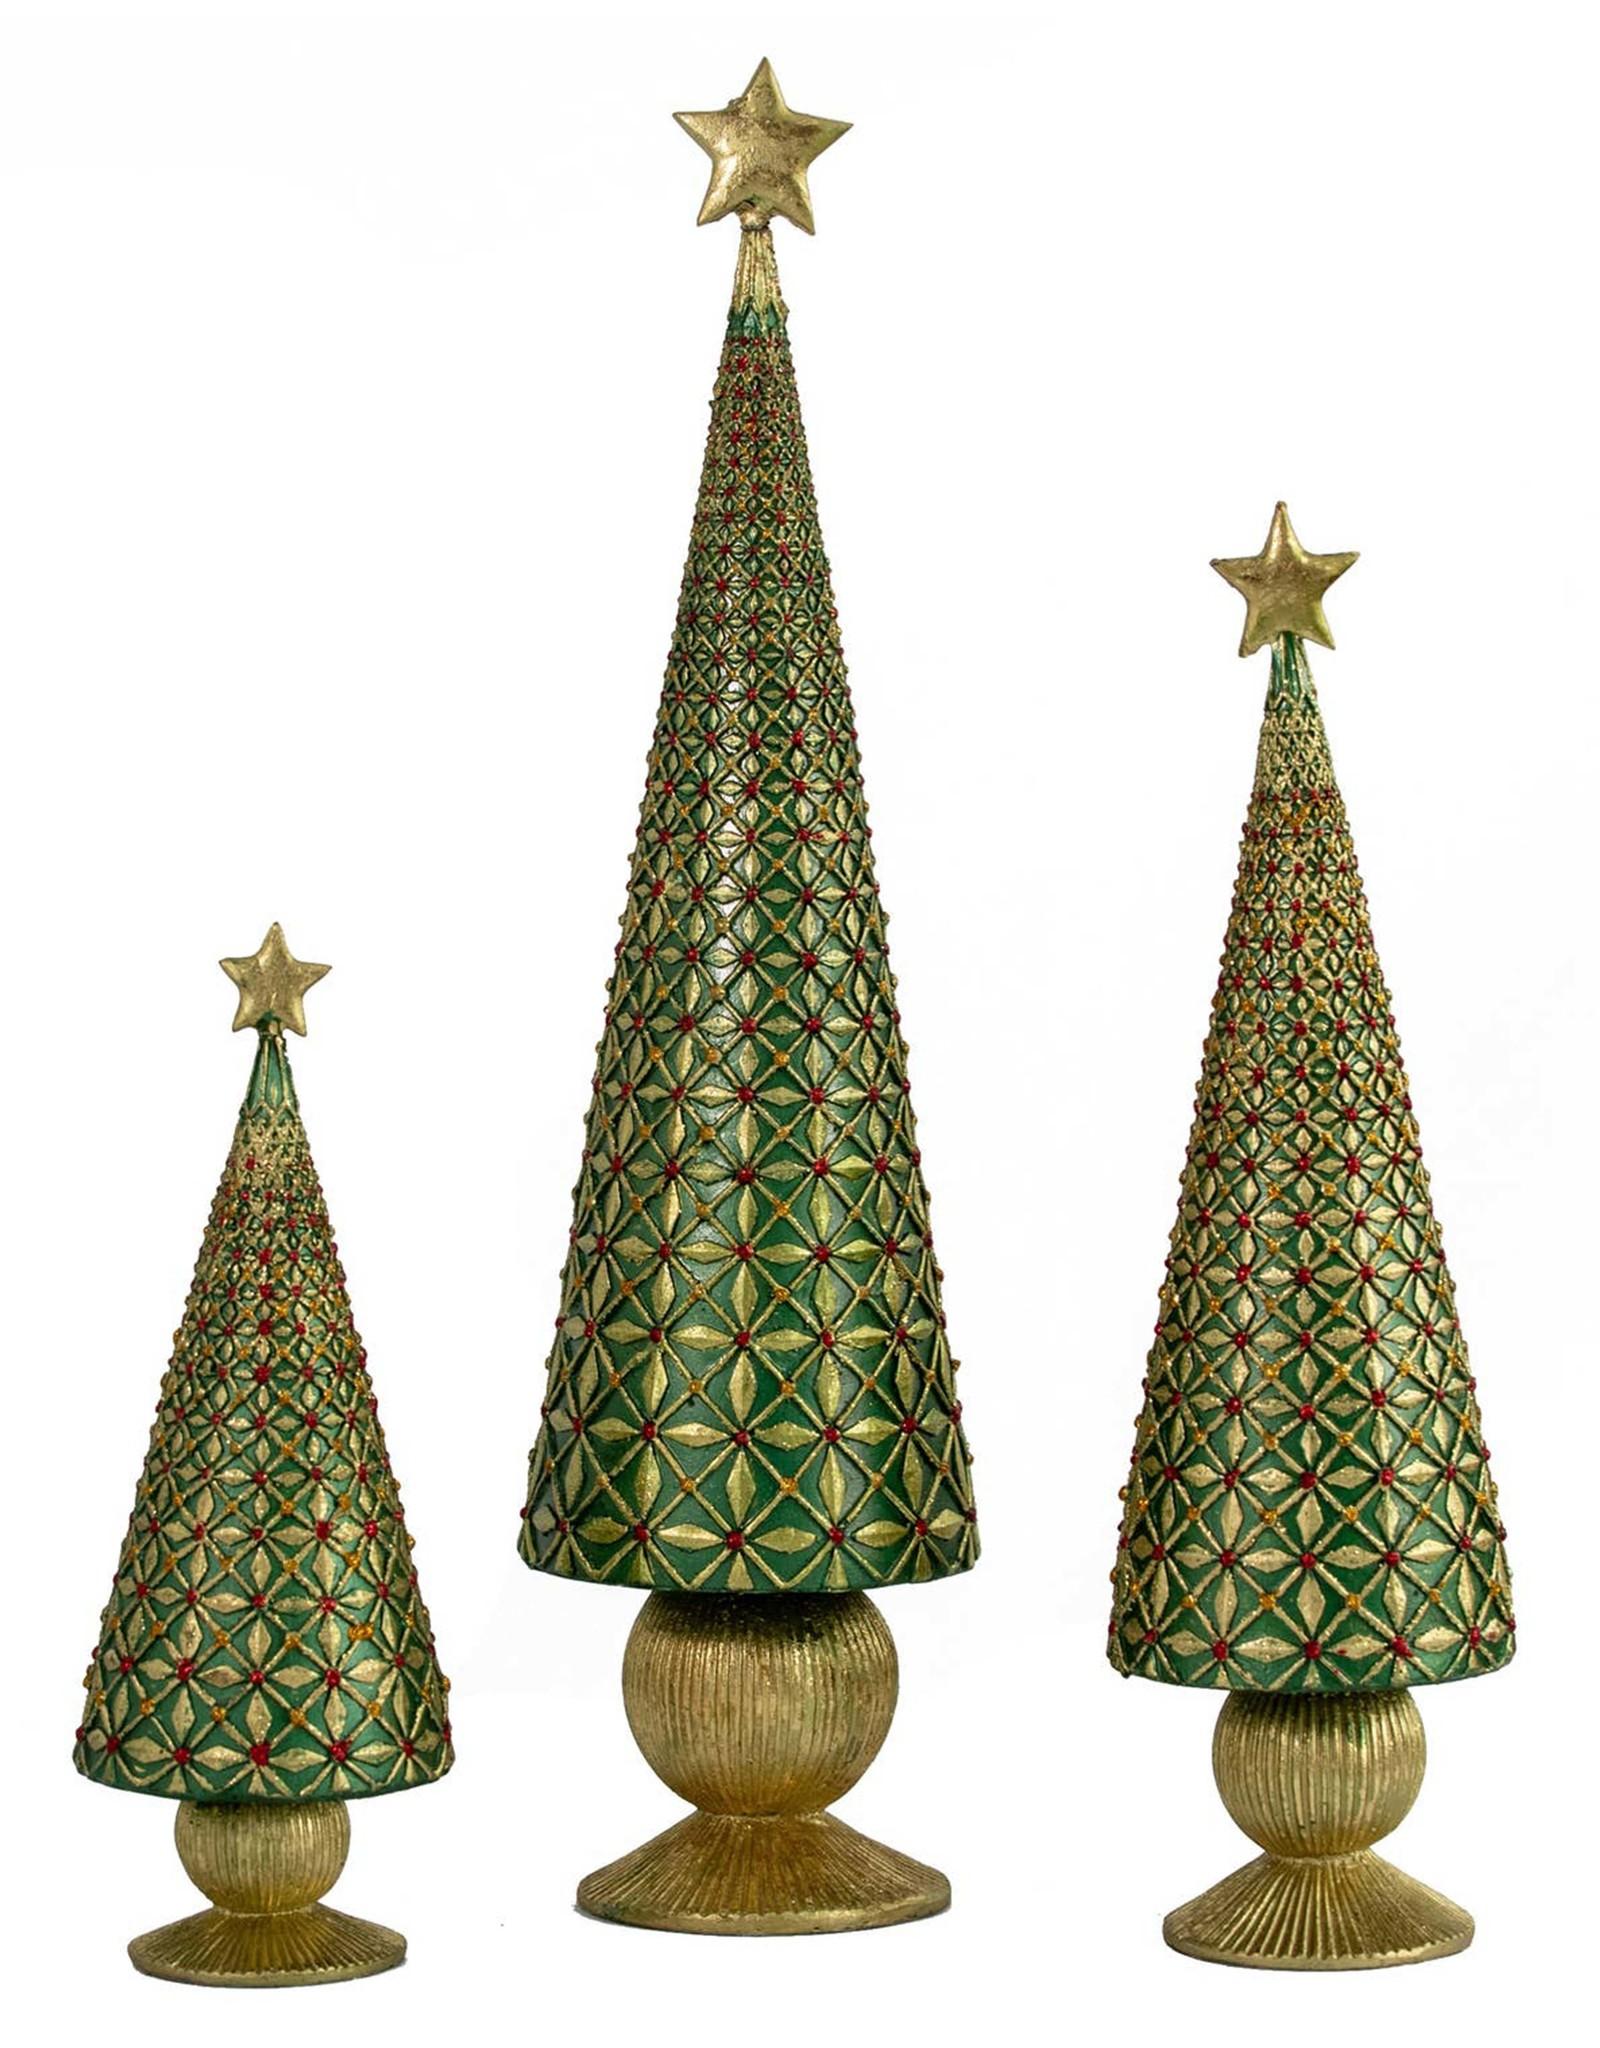 DEKORASYON SMALL DIAMOND BURST CONE TREE